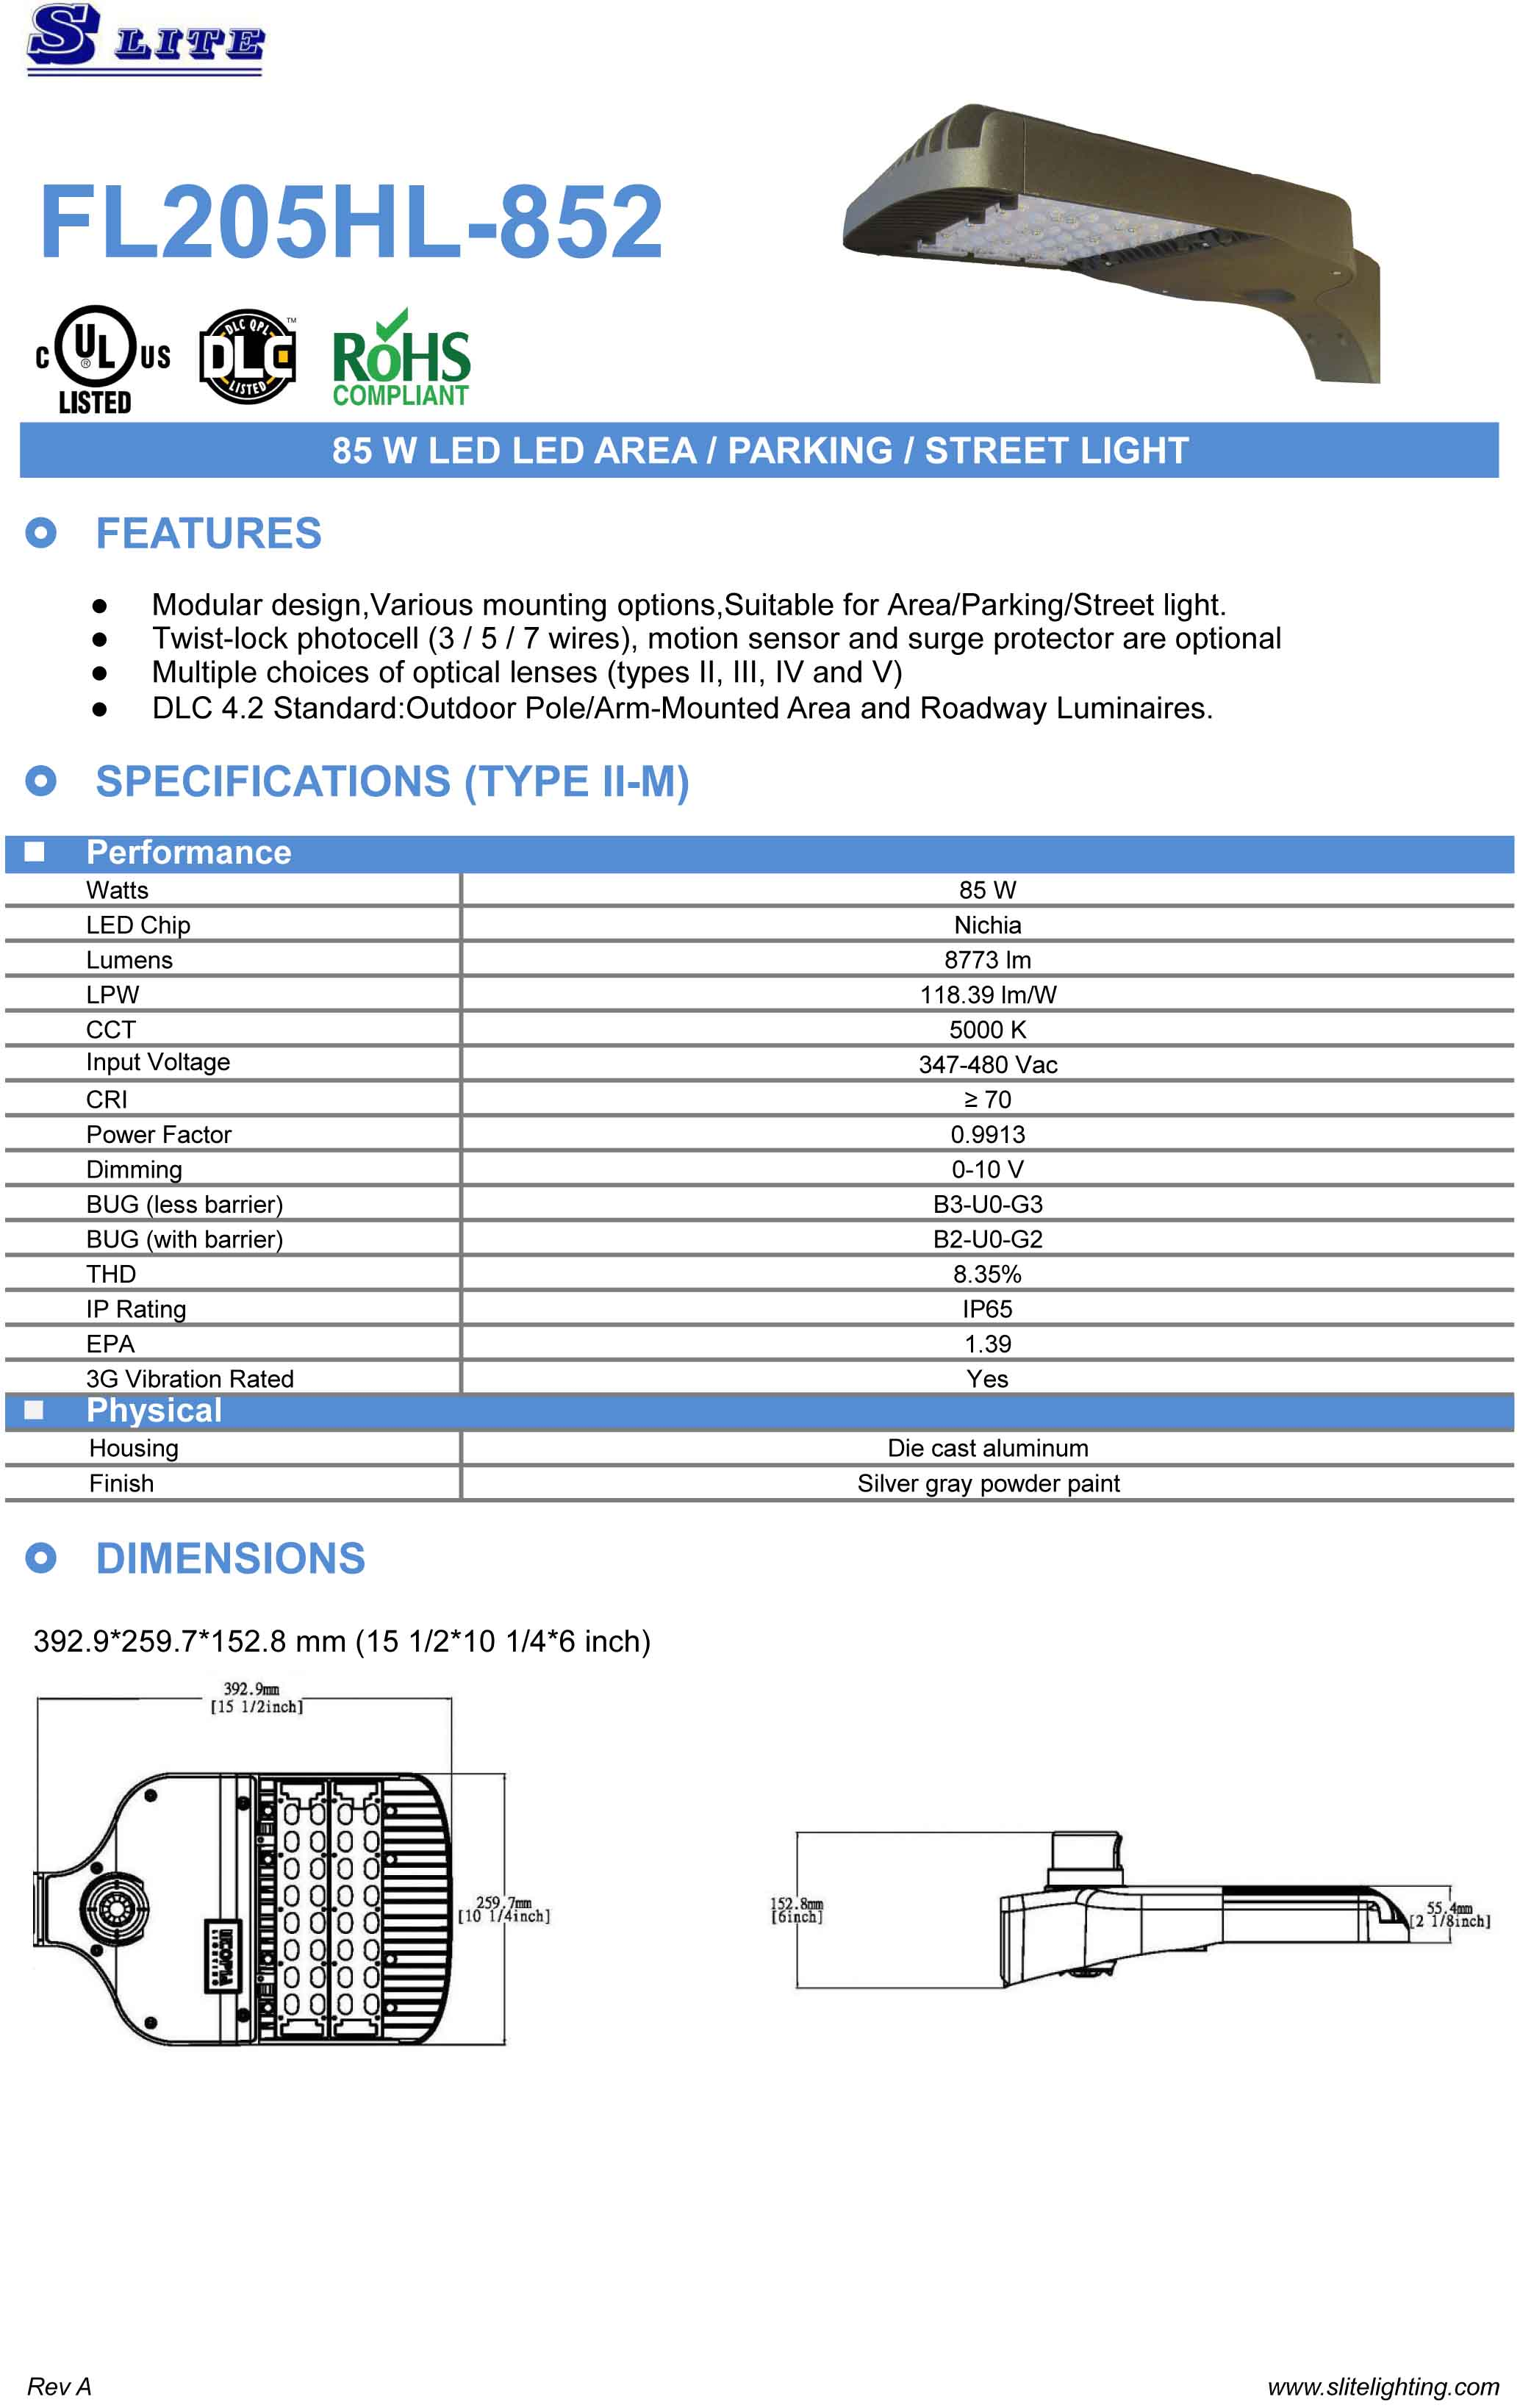 Area Light S Lite Co Ltd Parking Lot Pole Wiring Diagram Close Window Catalog Printing